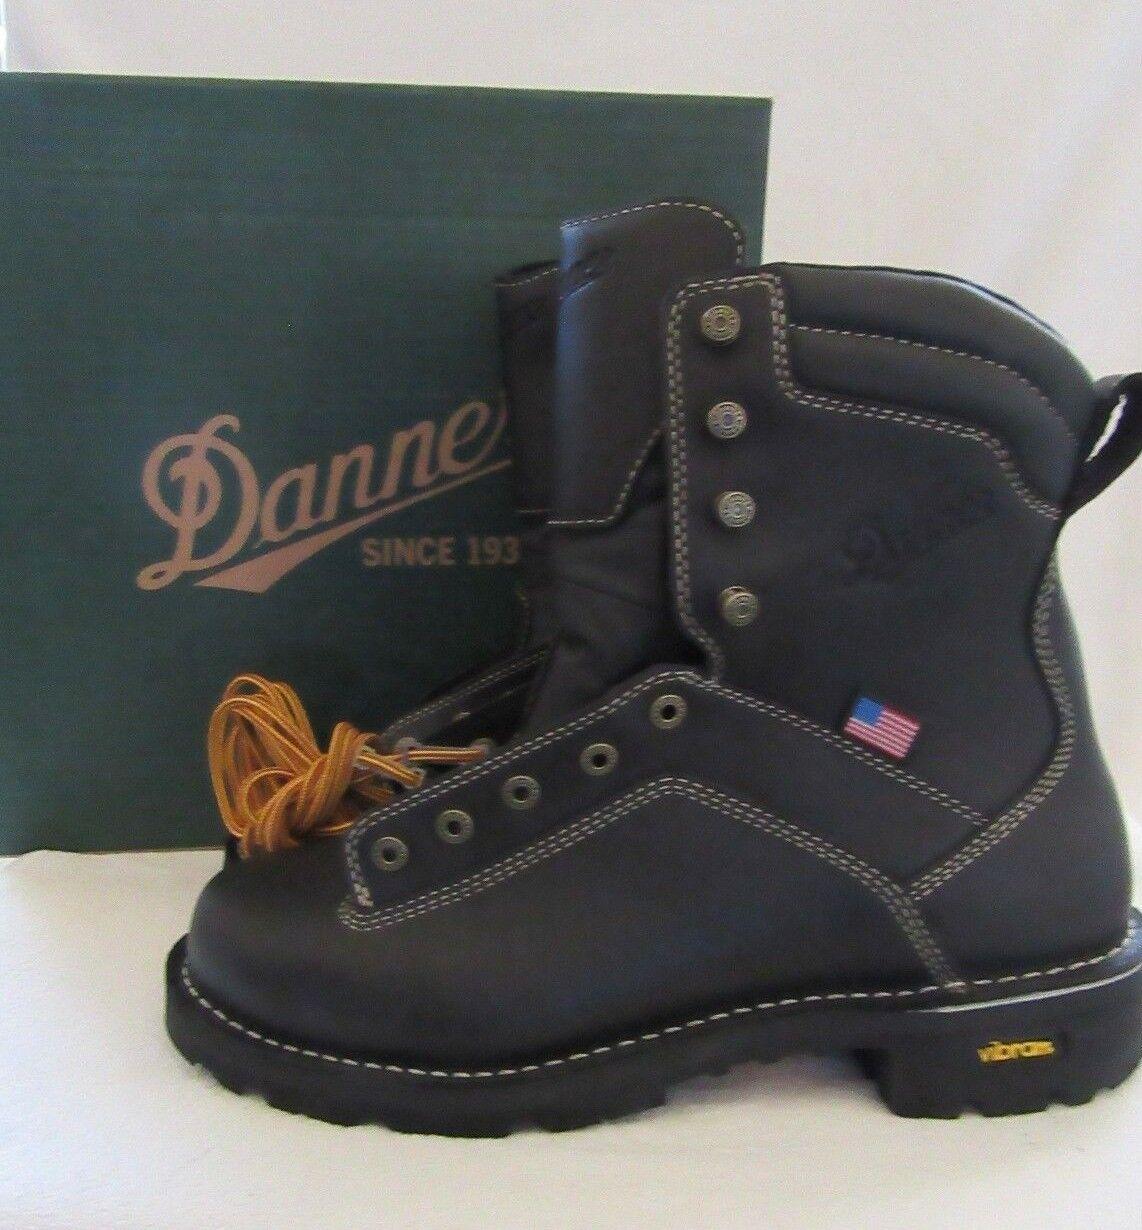 DANNER 17309 Quarry USA Mens nero Leather Work stivali scarpe Dimensione 11 D EU 45 NWB